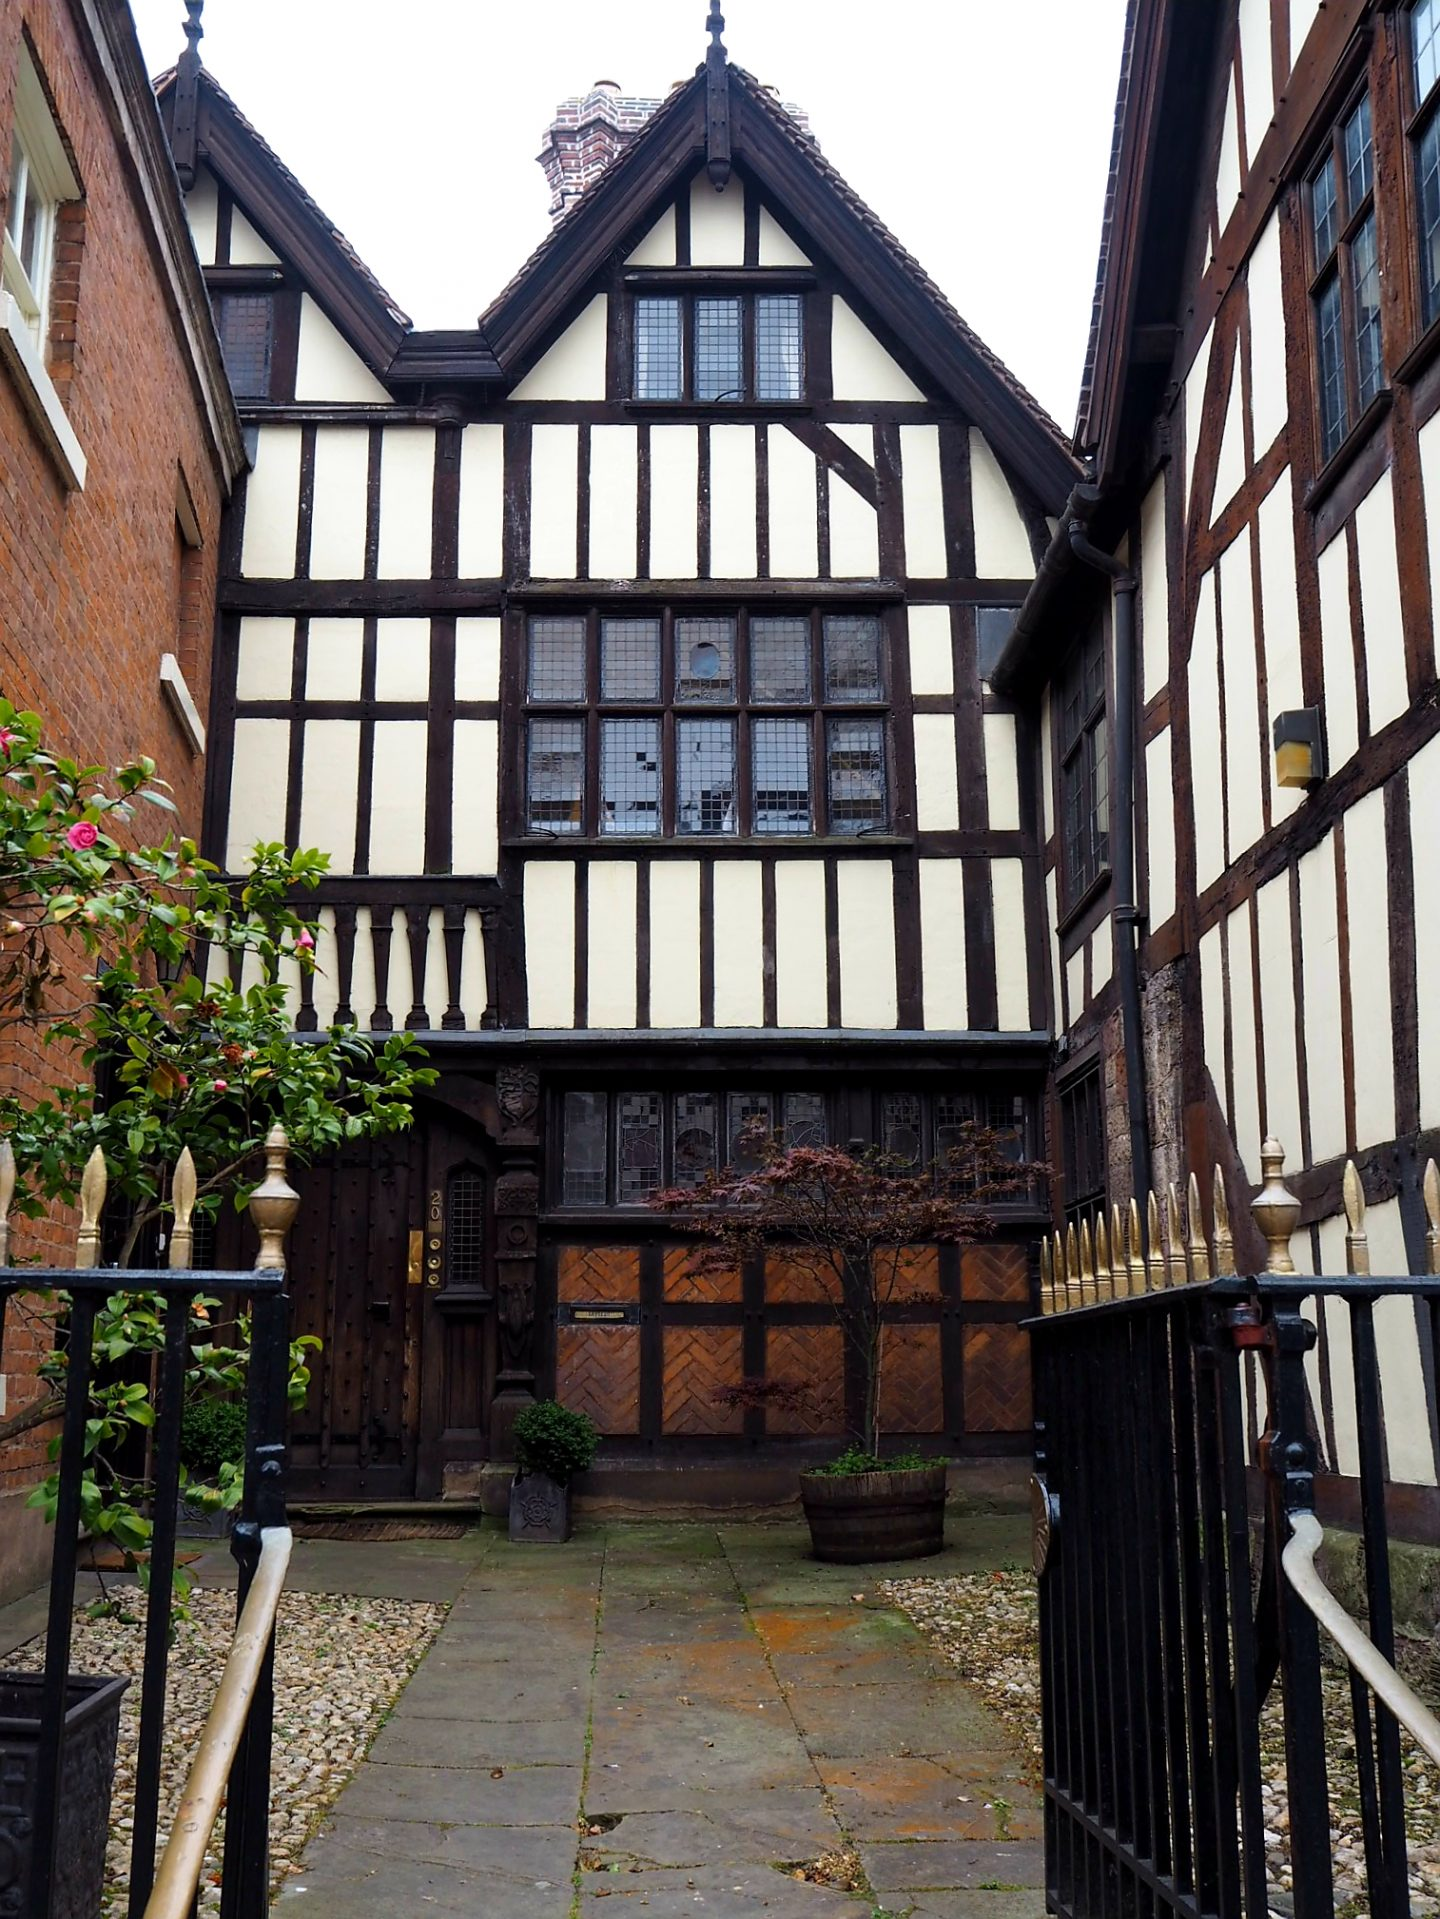 The Olde House Shrewsbury